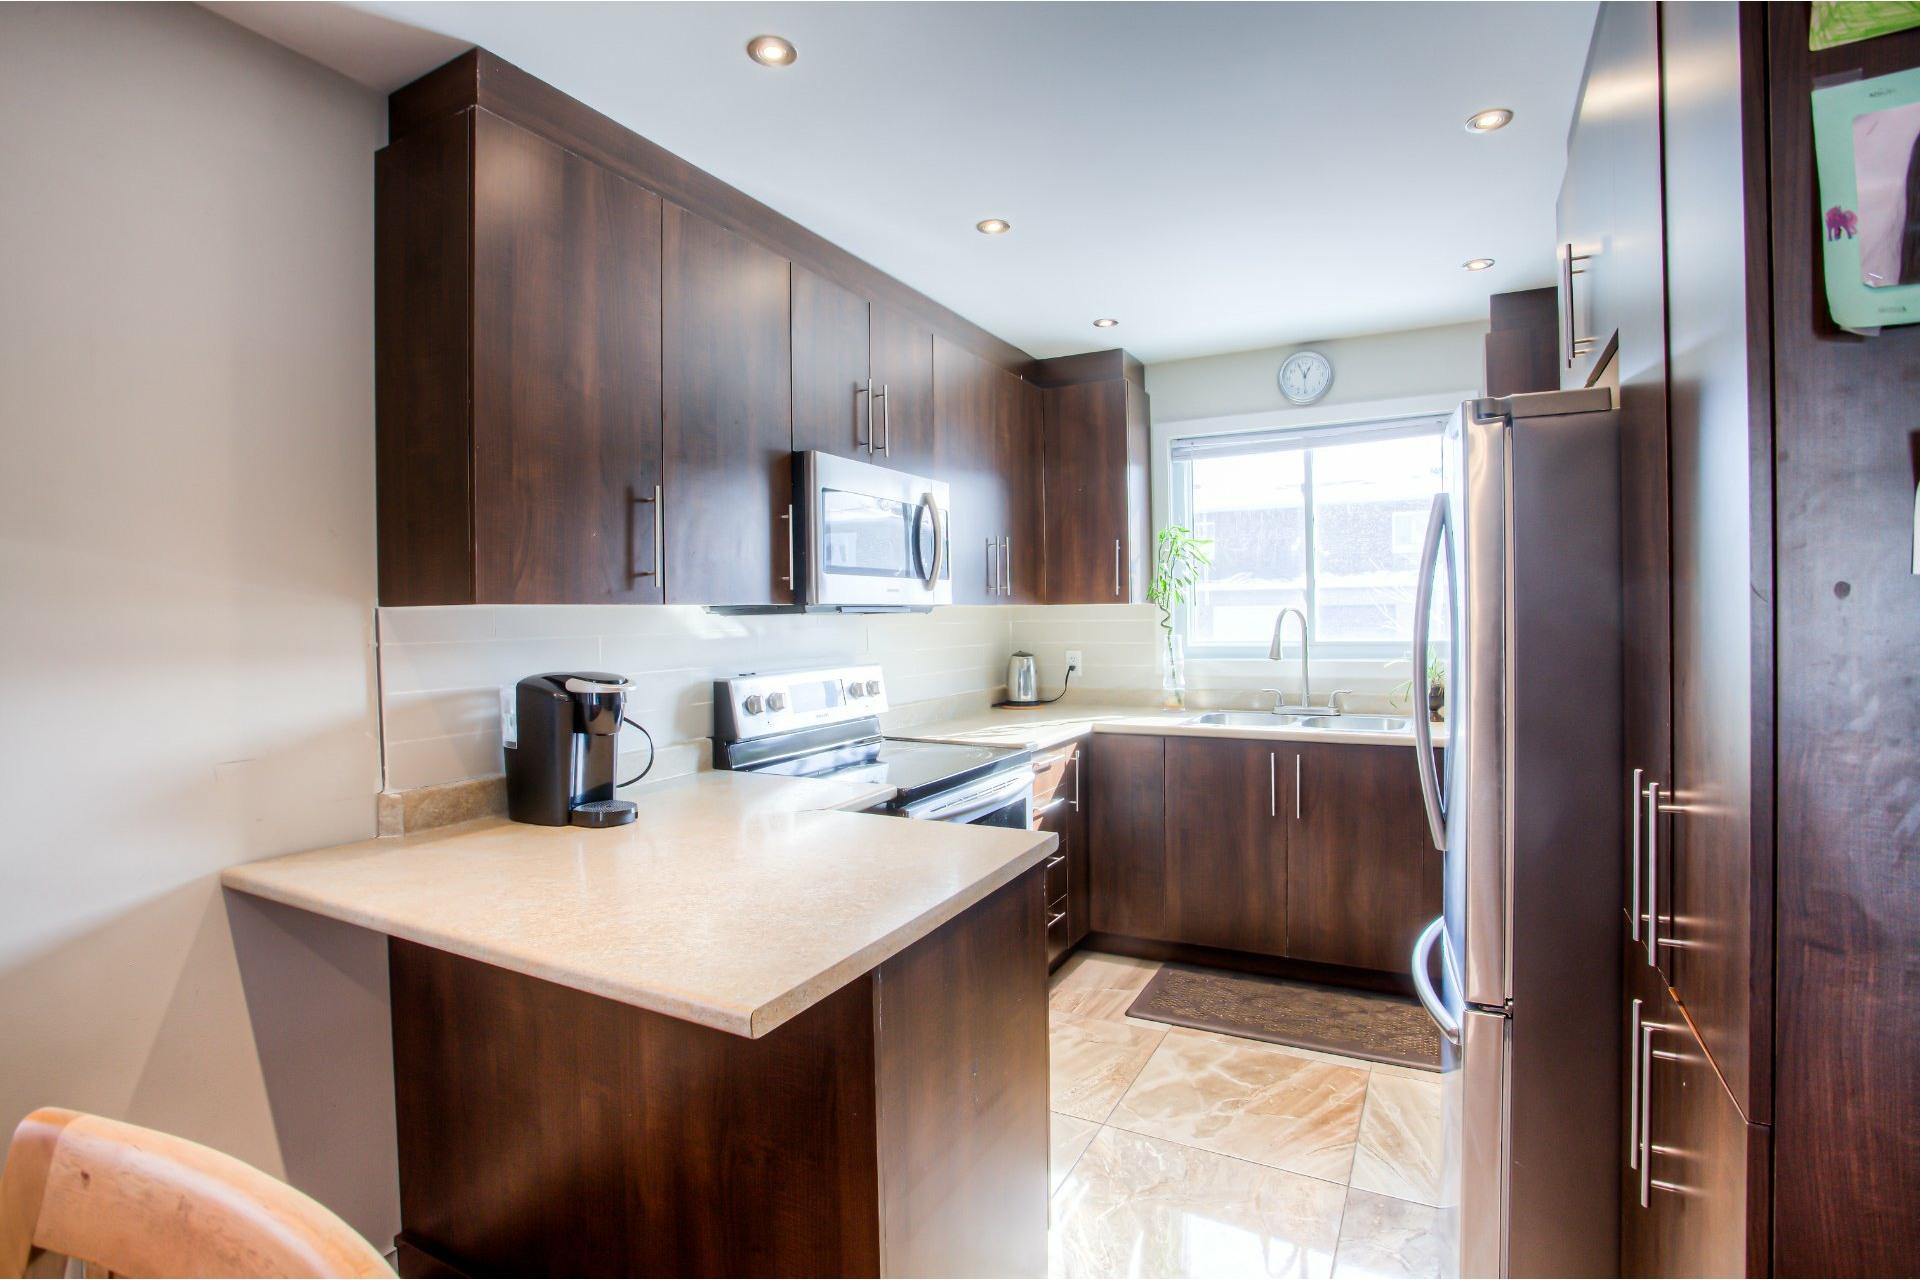 image 10 - House For rent Pierrefonds-Roxboro Montréal  - 9 rooms